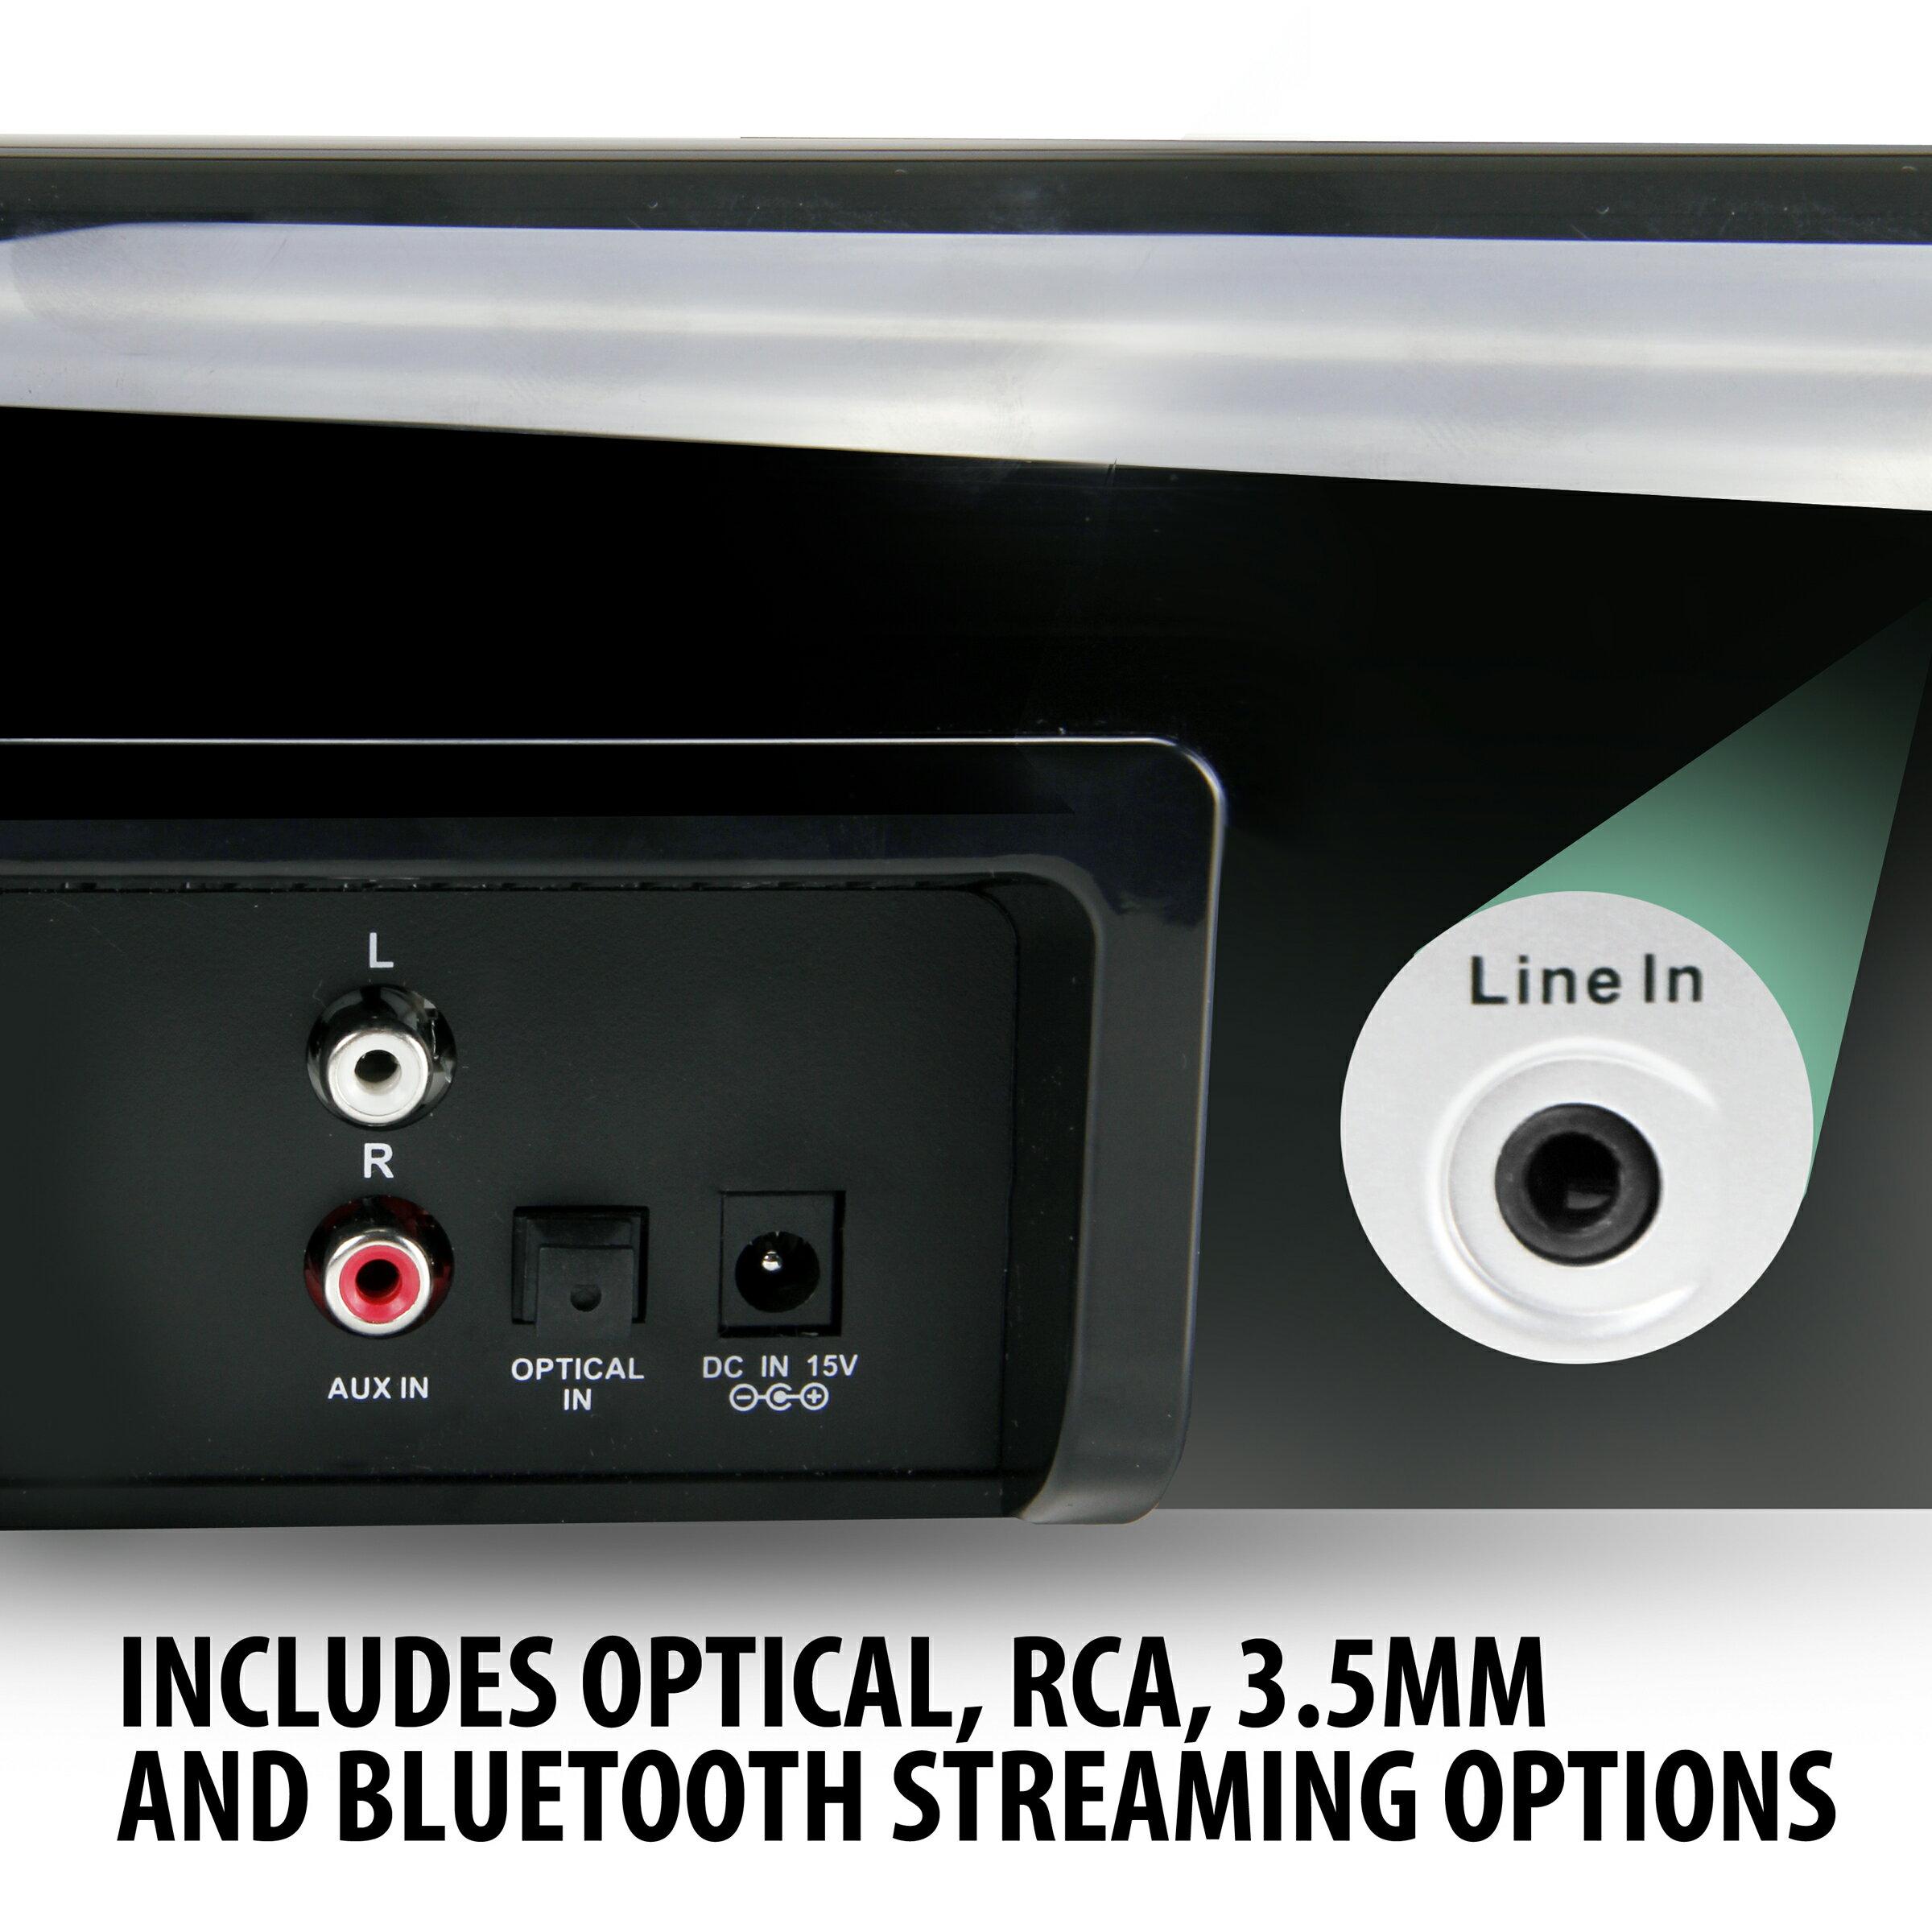 GOgroove Bluetooth Ultra Slim Sound Bar Speaker System w/ Wall Mounting Kit, Optical / Analog Inputs 5